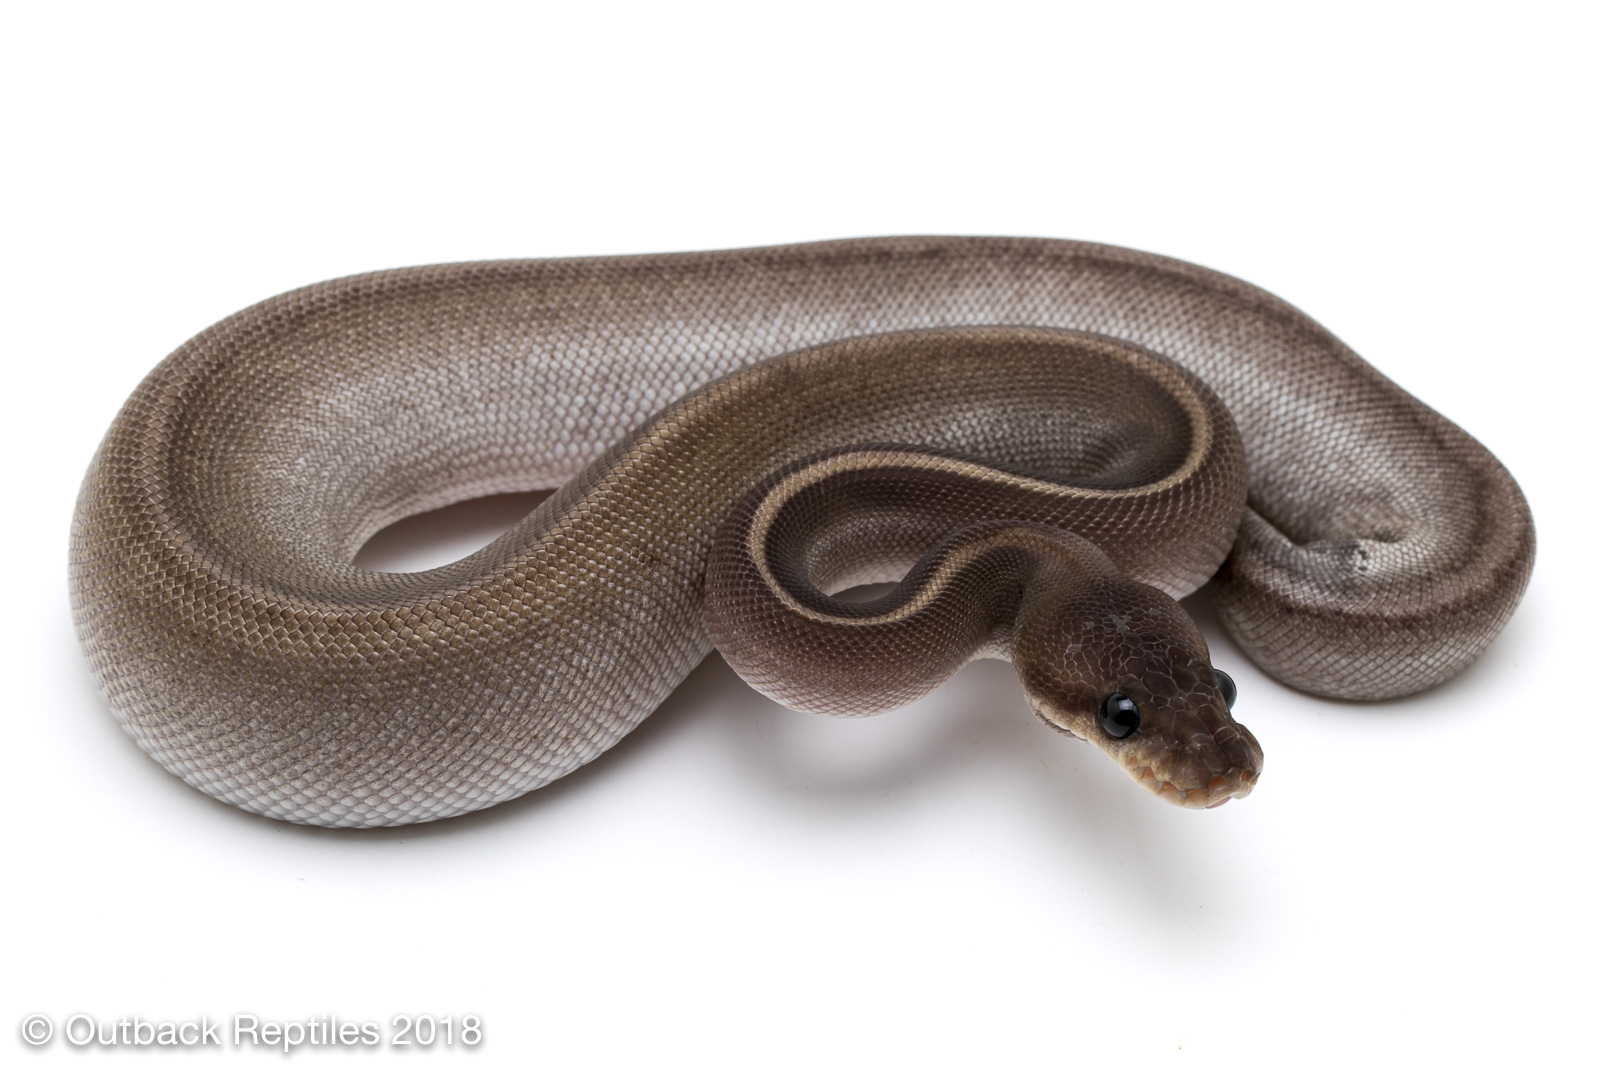 Mojave Whiplash Ball Python